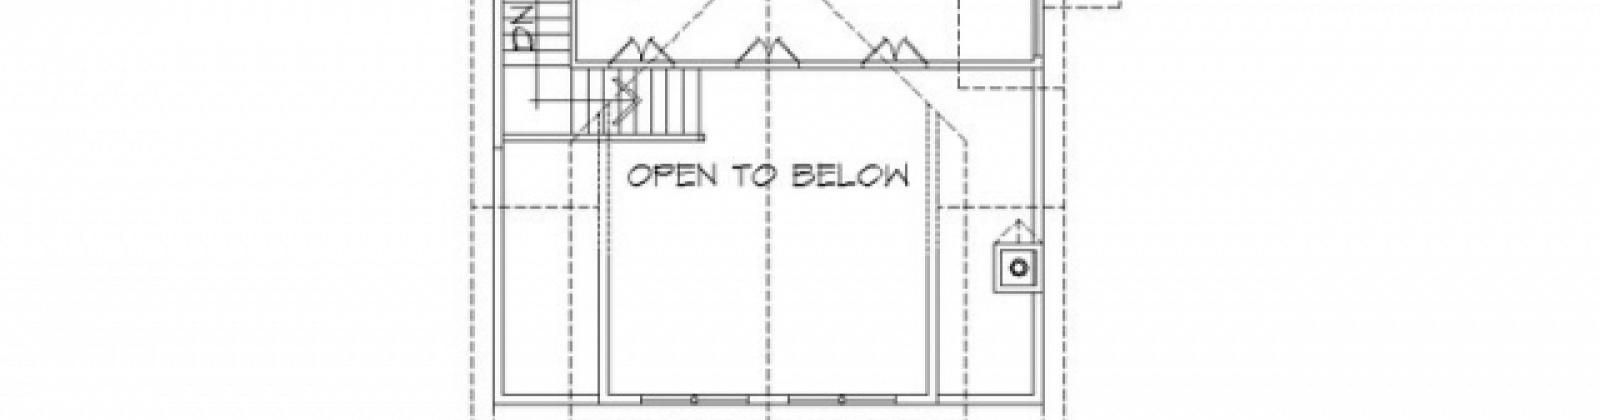 Main Street,Trave,USA,Michigan,United States 10001,2 BathroomsBathrooms,Office,Main Street,1006